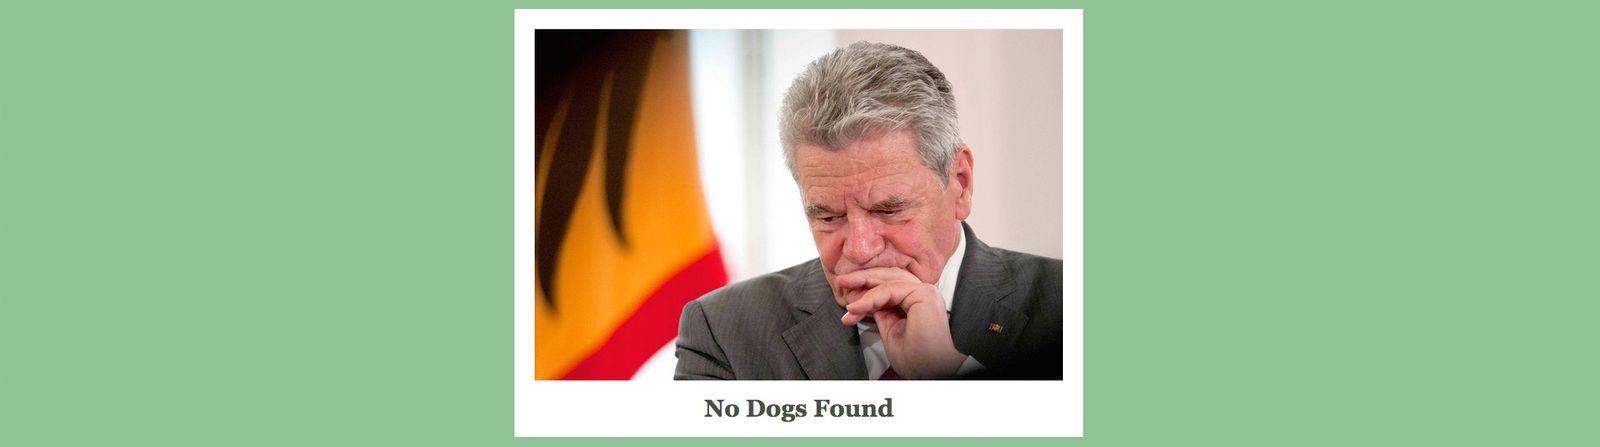 Gauck Hund